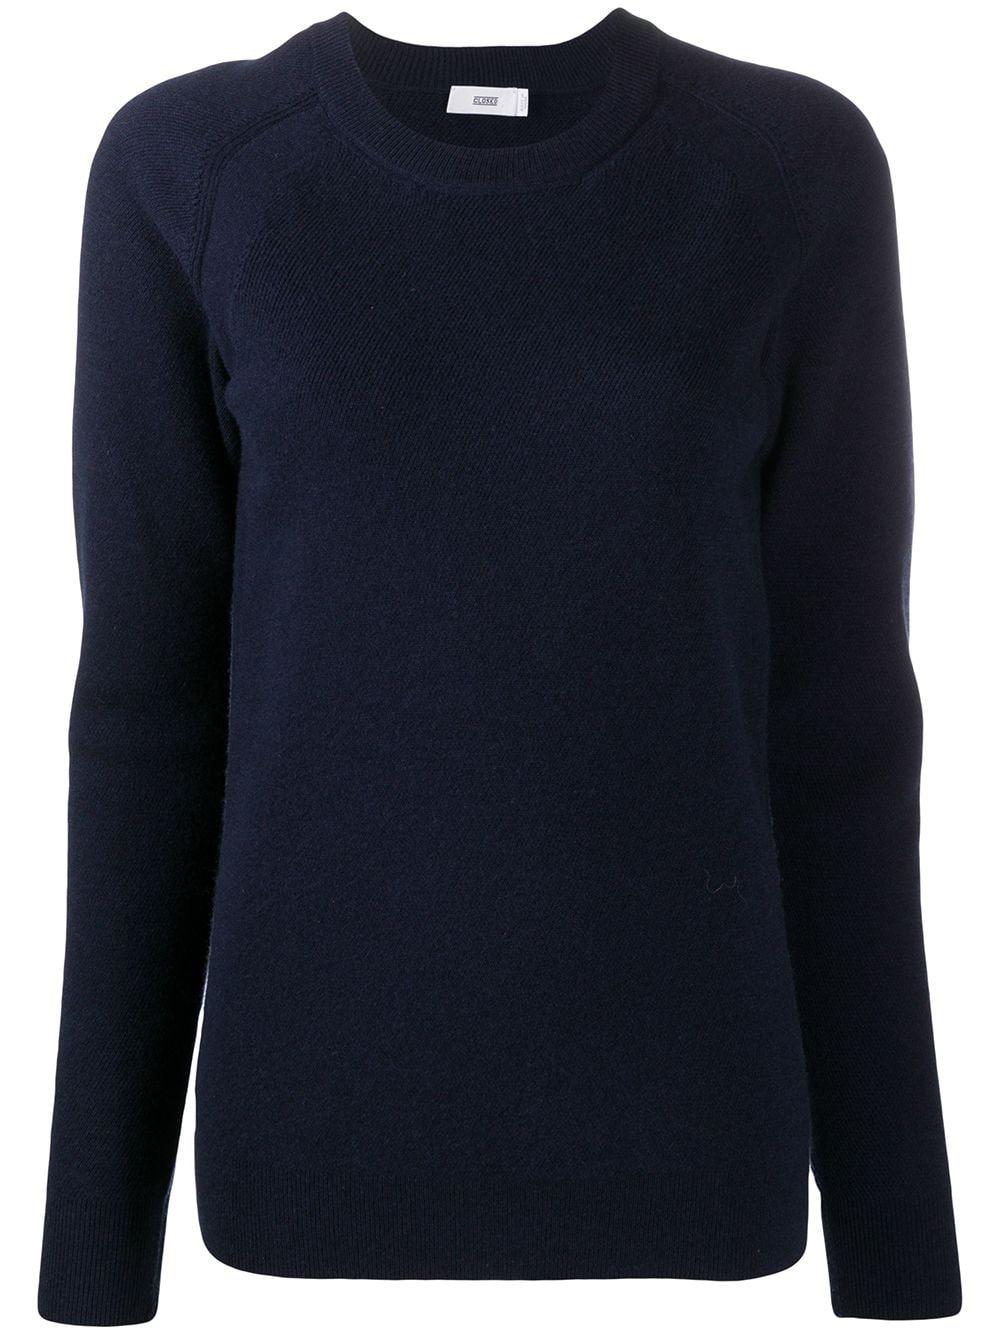 Wool-cashmere Blend Fine Knit Crew-neck Sweater